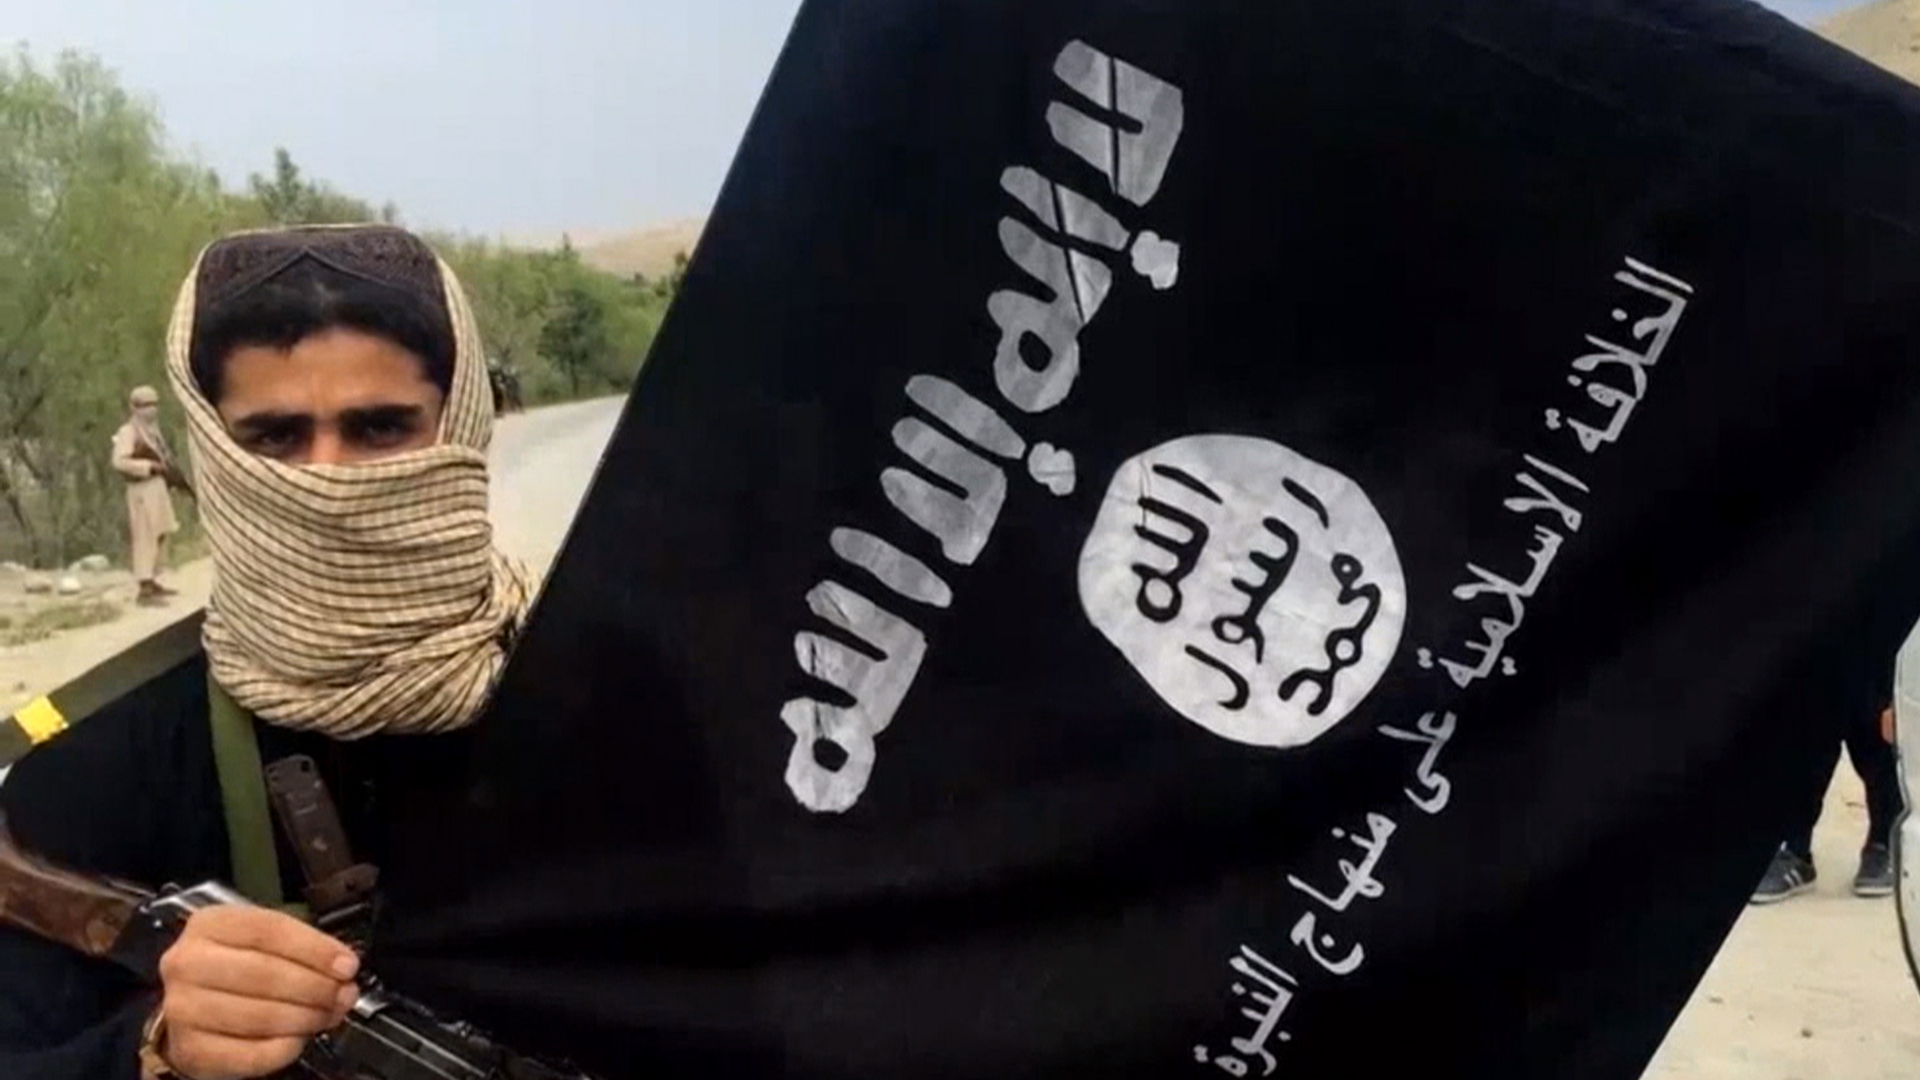 ISIS Militants Inside The USA/North America.  #isis #isil #nato #alqaeda #alshabaab #terrorism #alnusra - cover